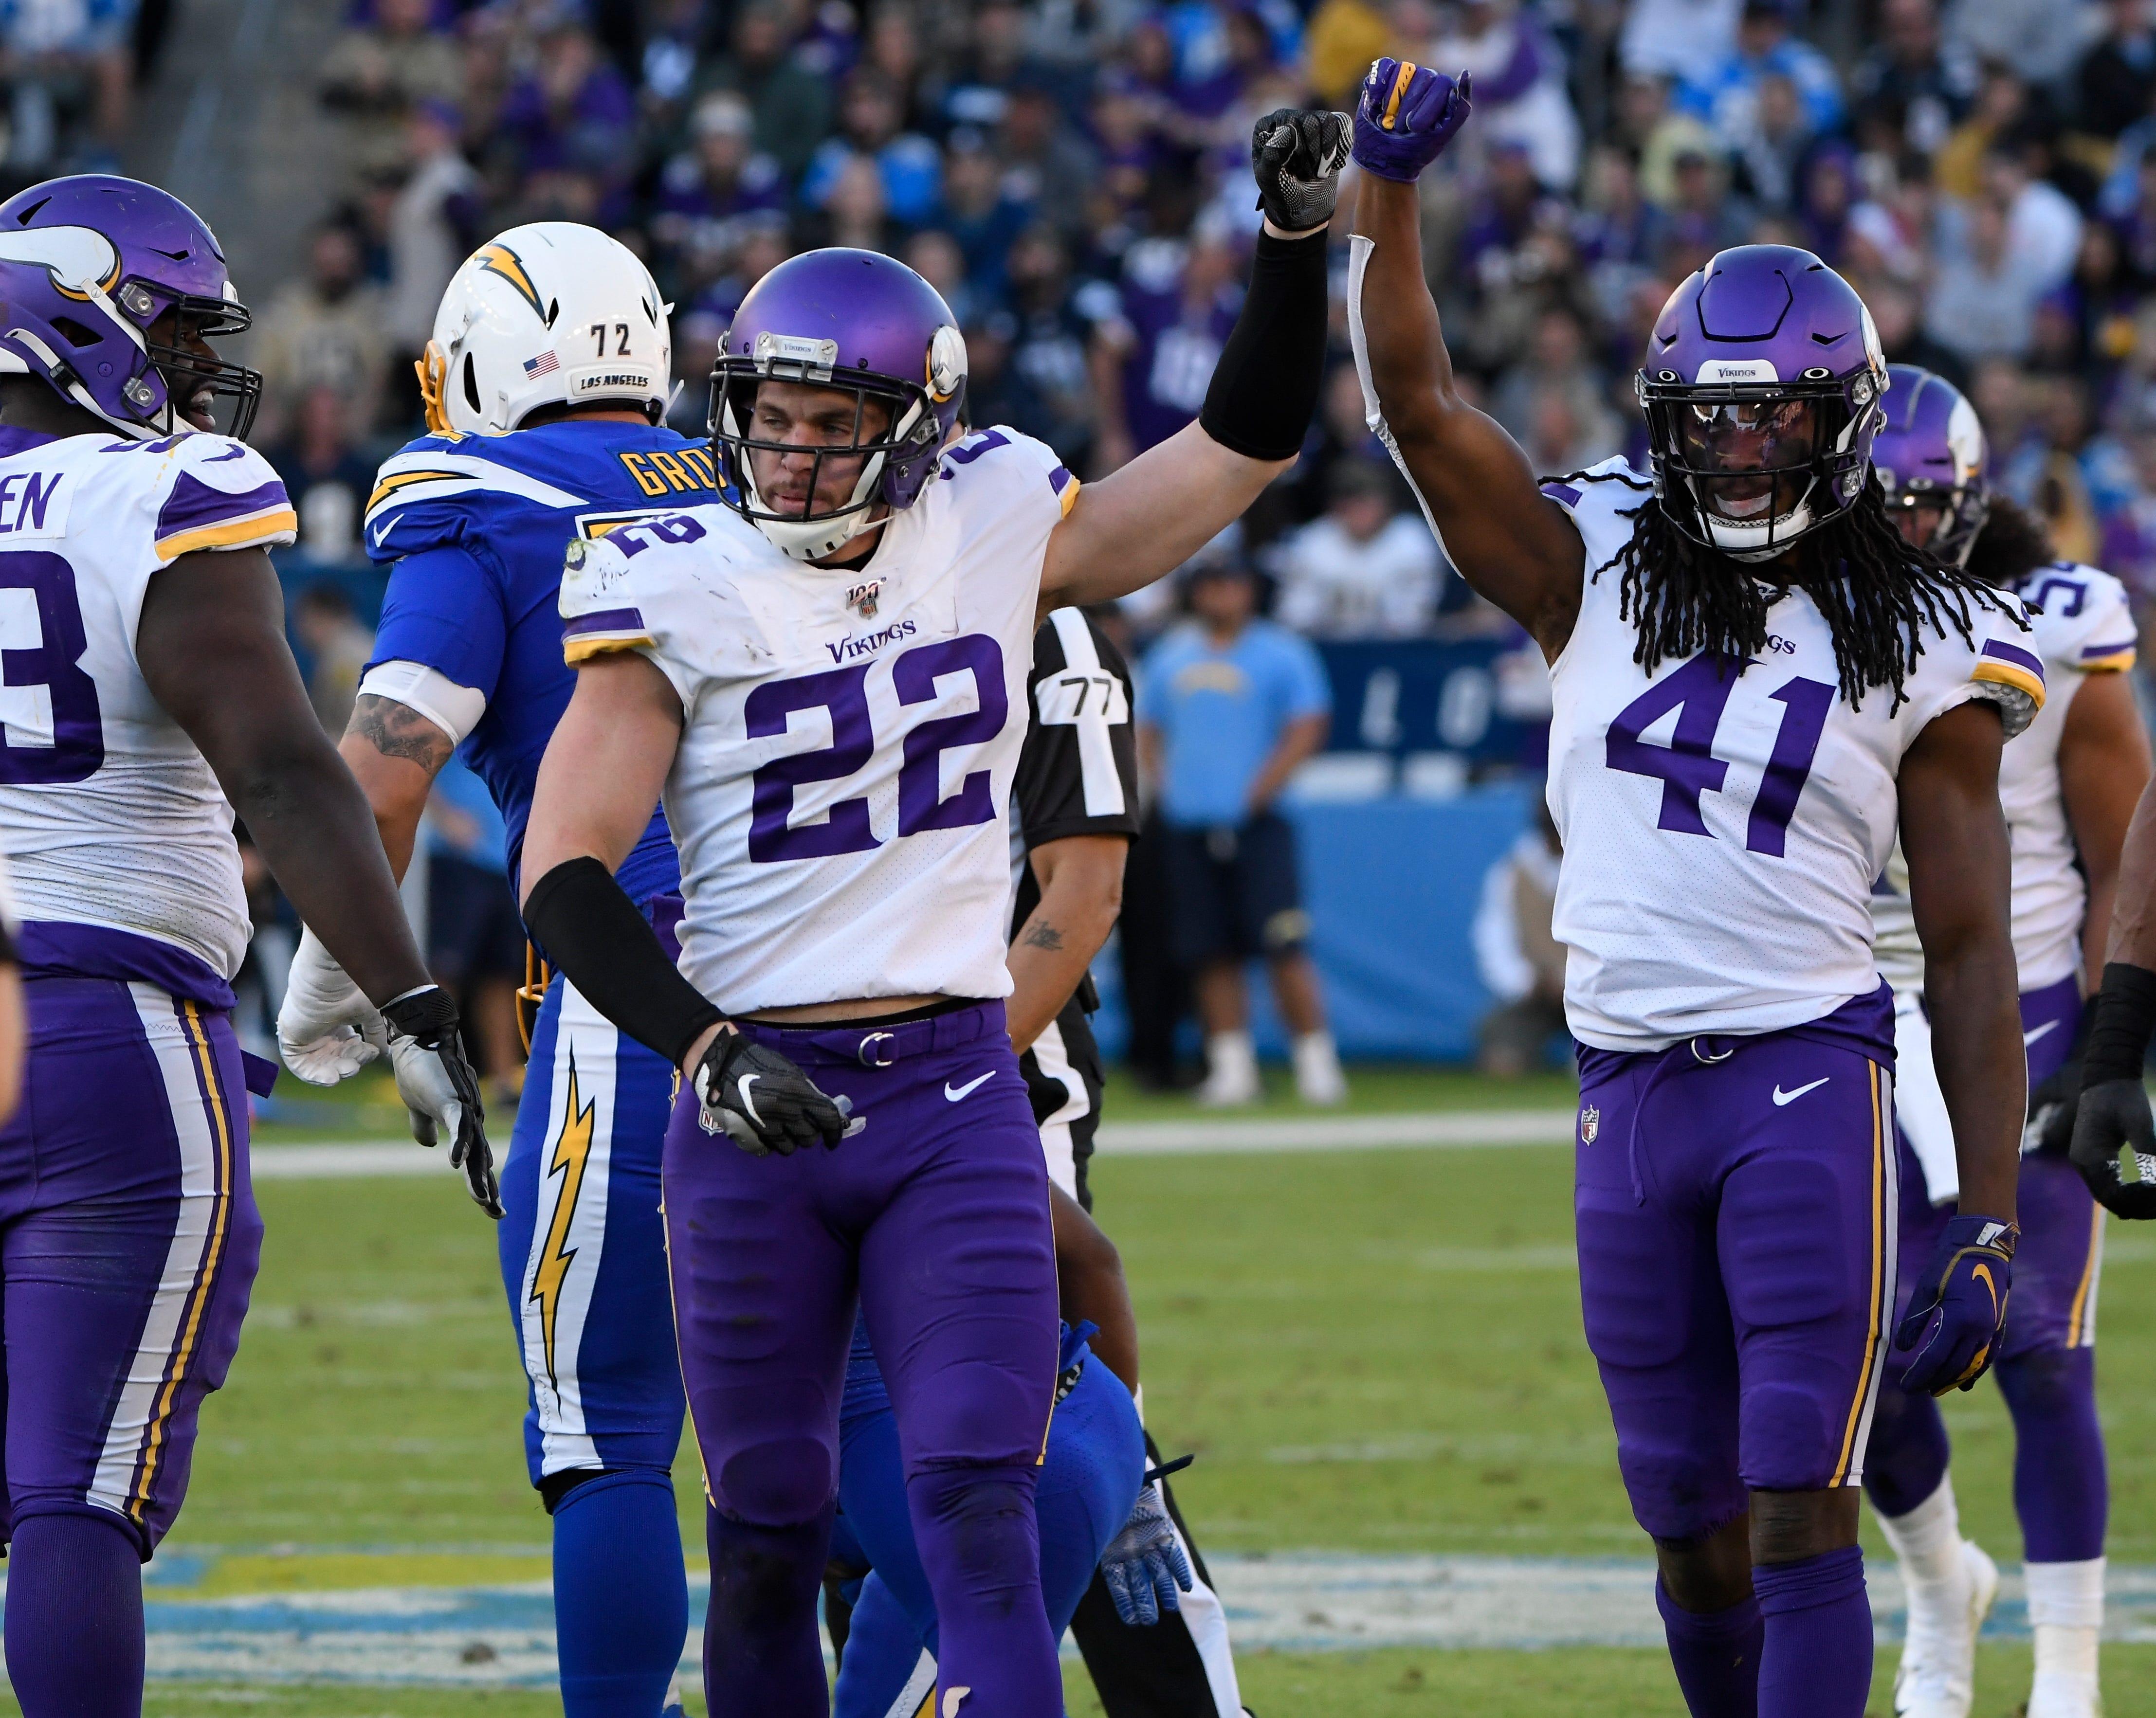 NFL trade deadline: What moves should all 32 teams make?